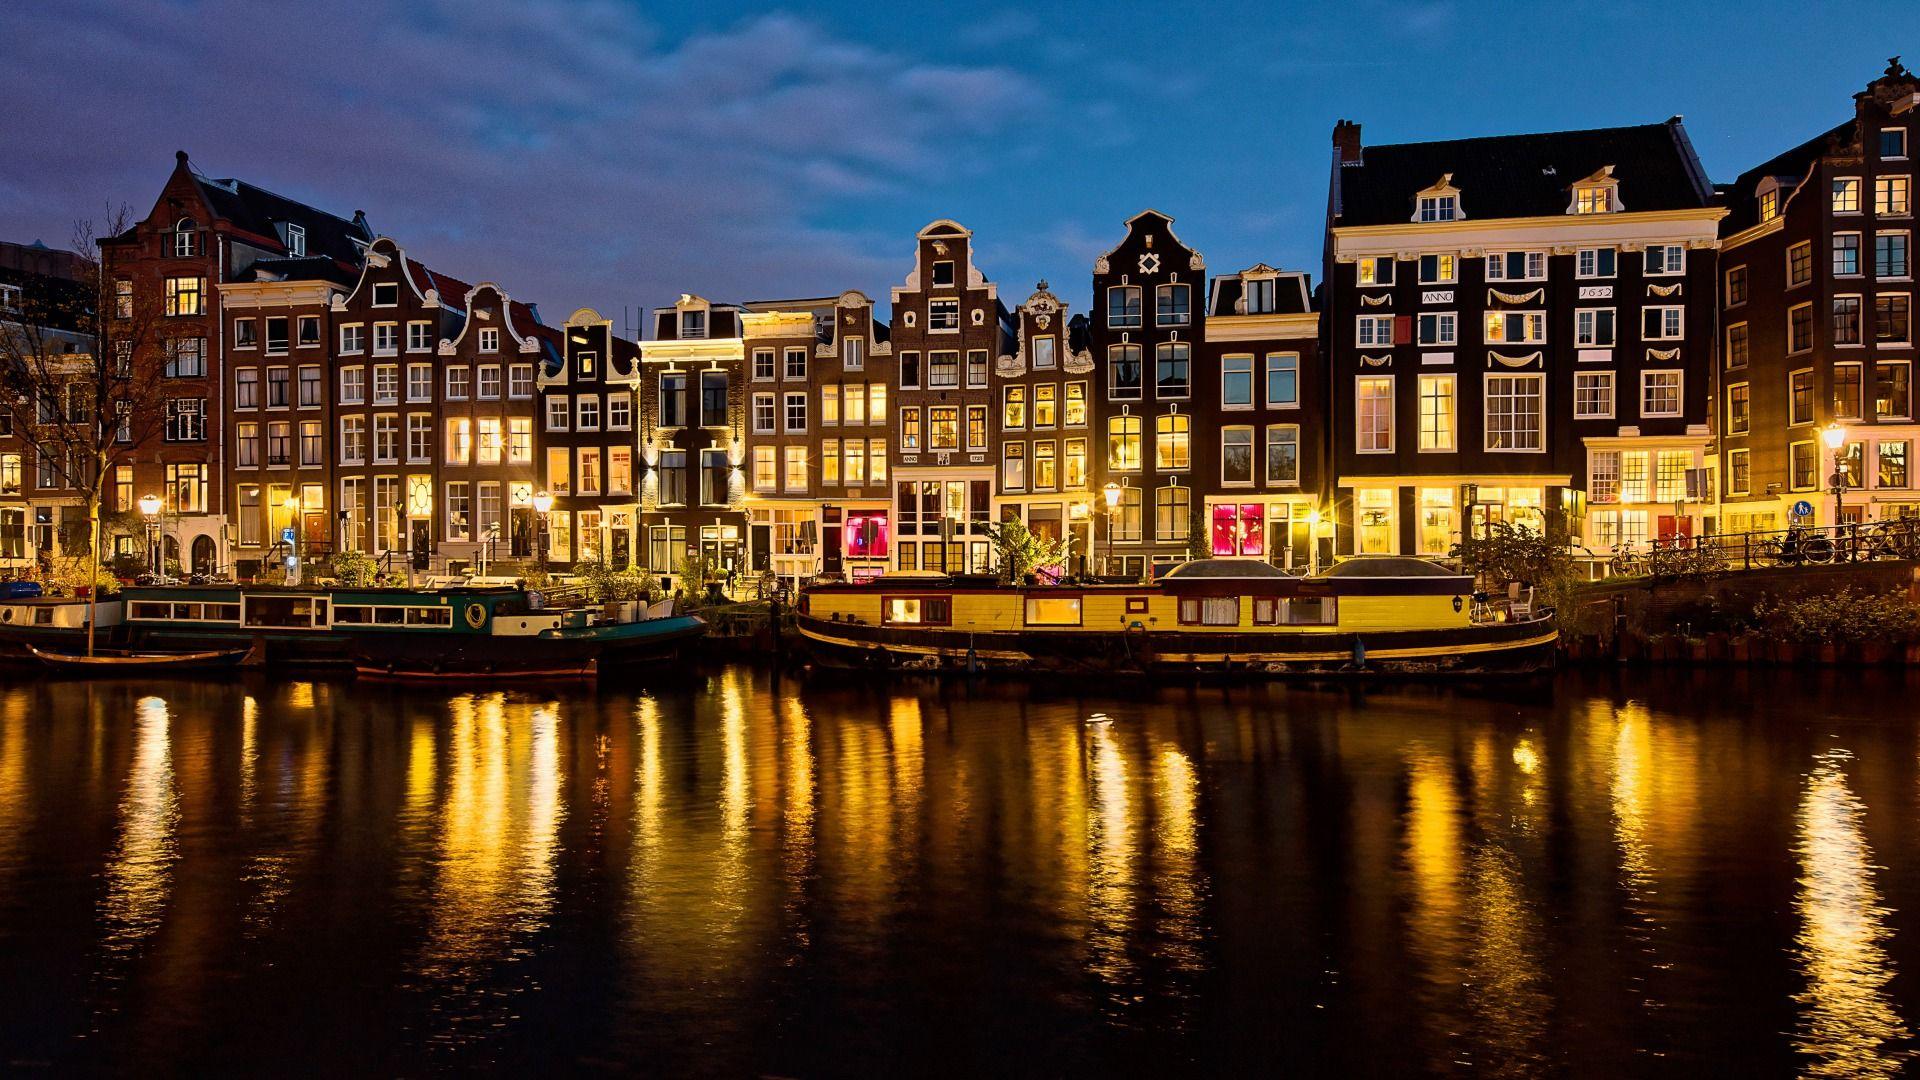 Amsterdam Cool HD Wallpaper